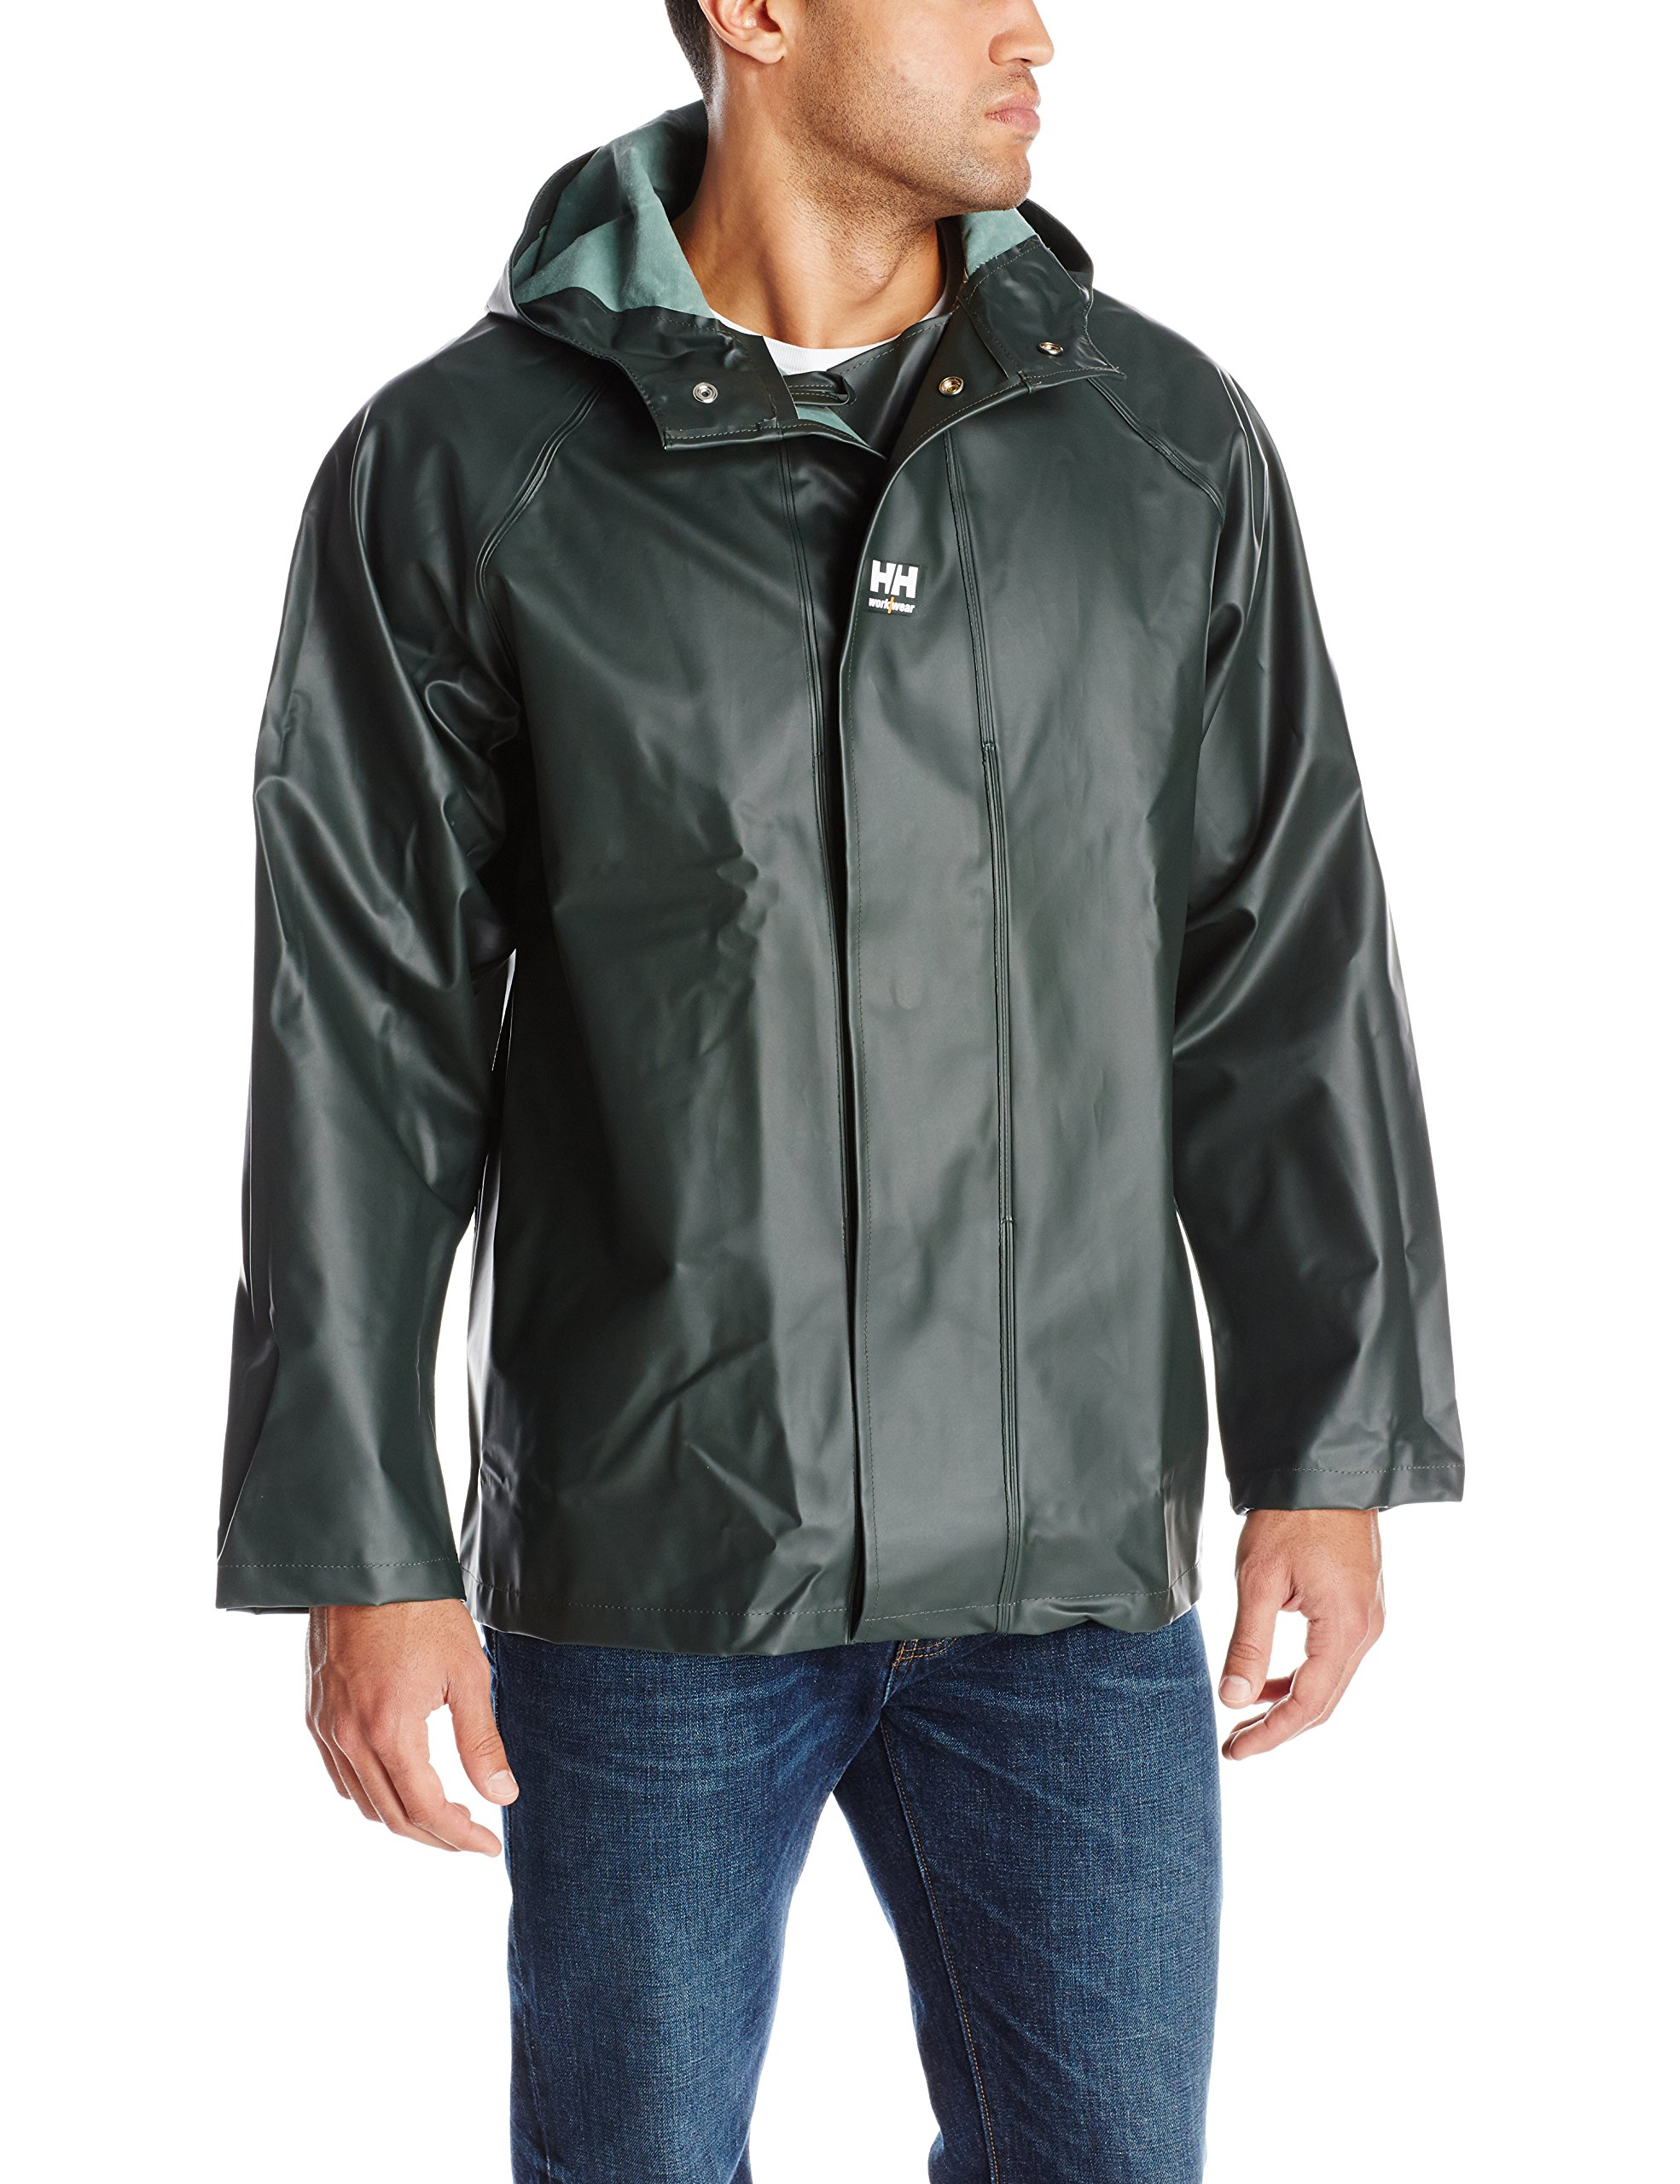 Helly Hansen Workwear Highliner Fishing Jacket, Dark Green, S